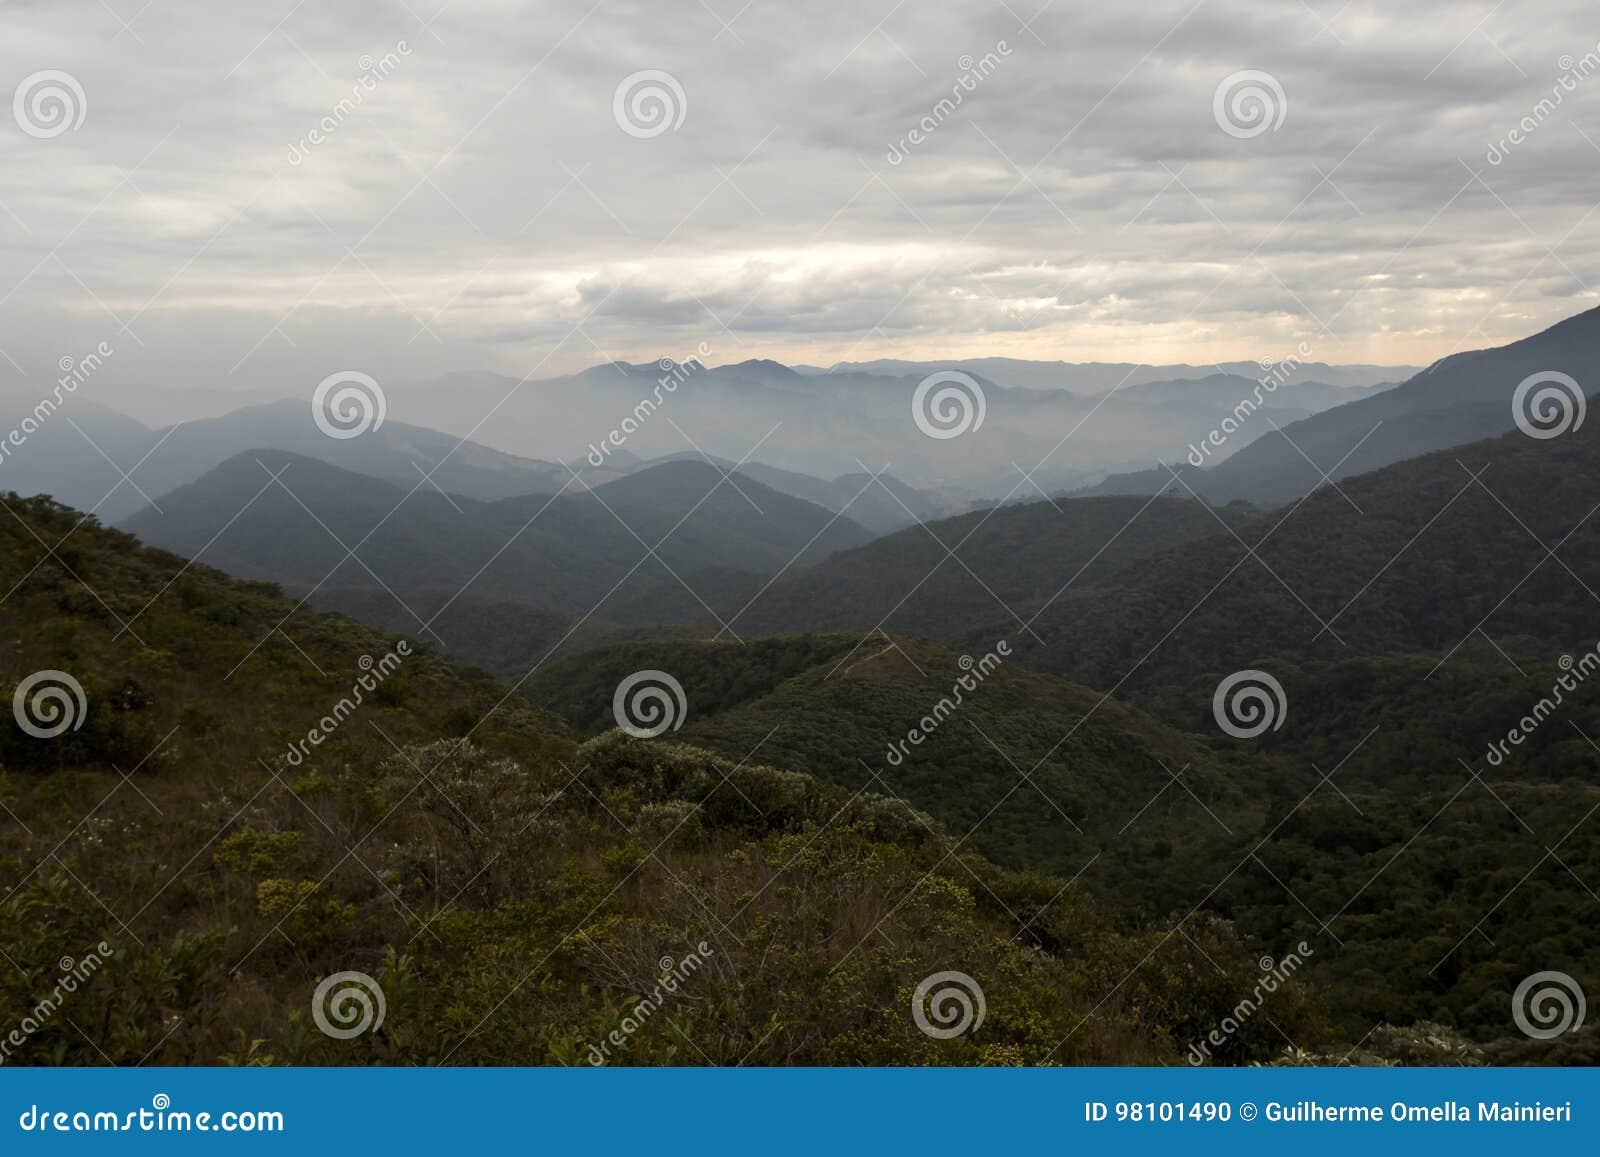 Serra fina与云彩的山脉在水平的冬天米纳斯吉拉斯巴西